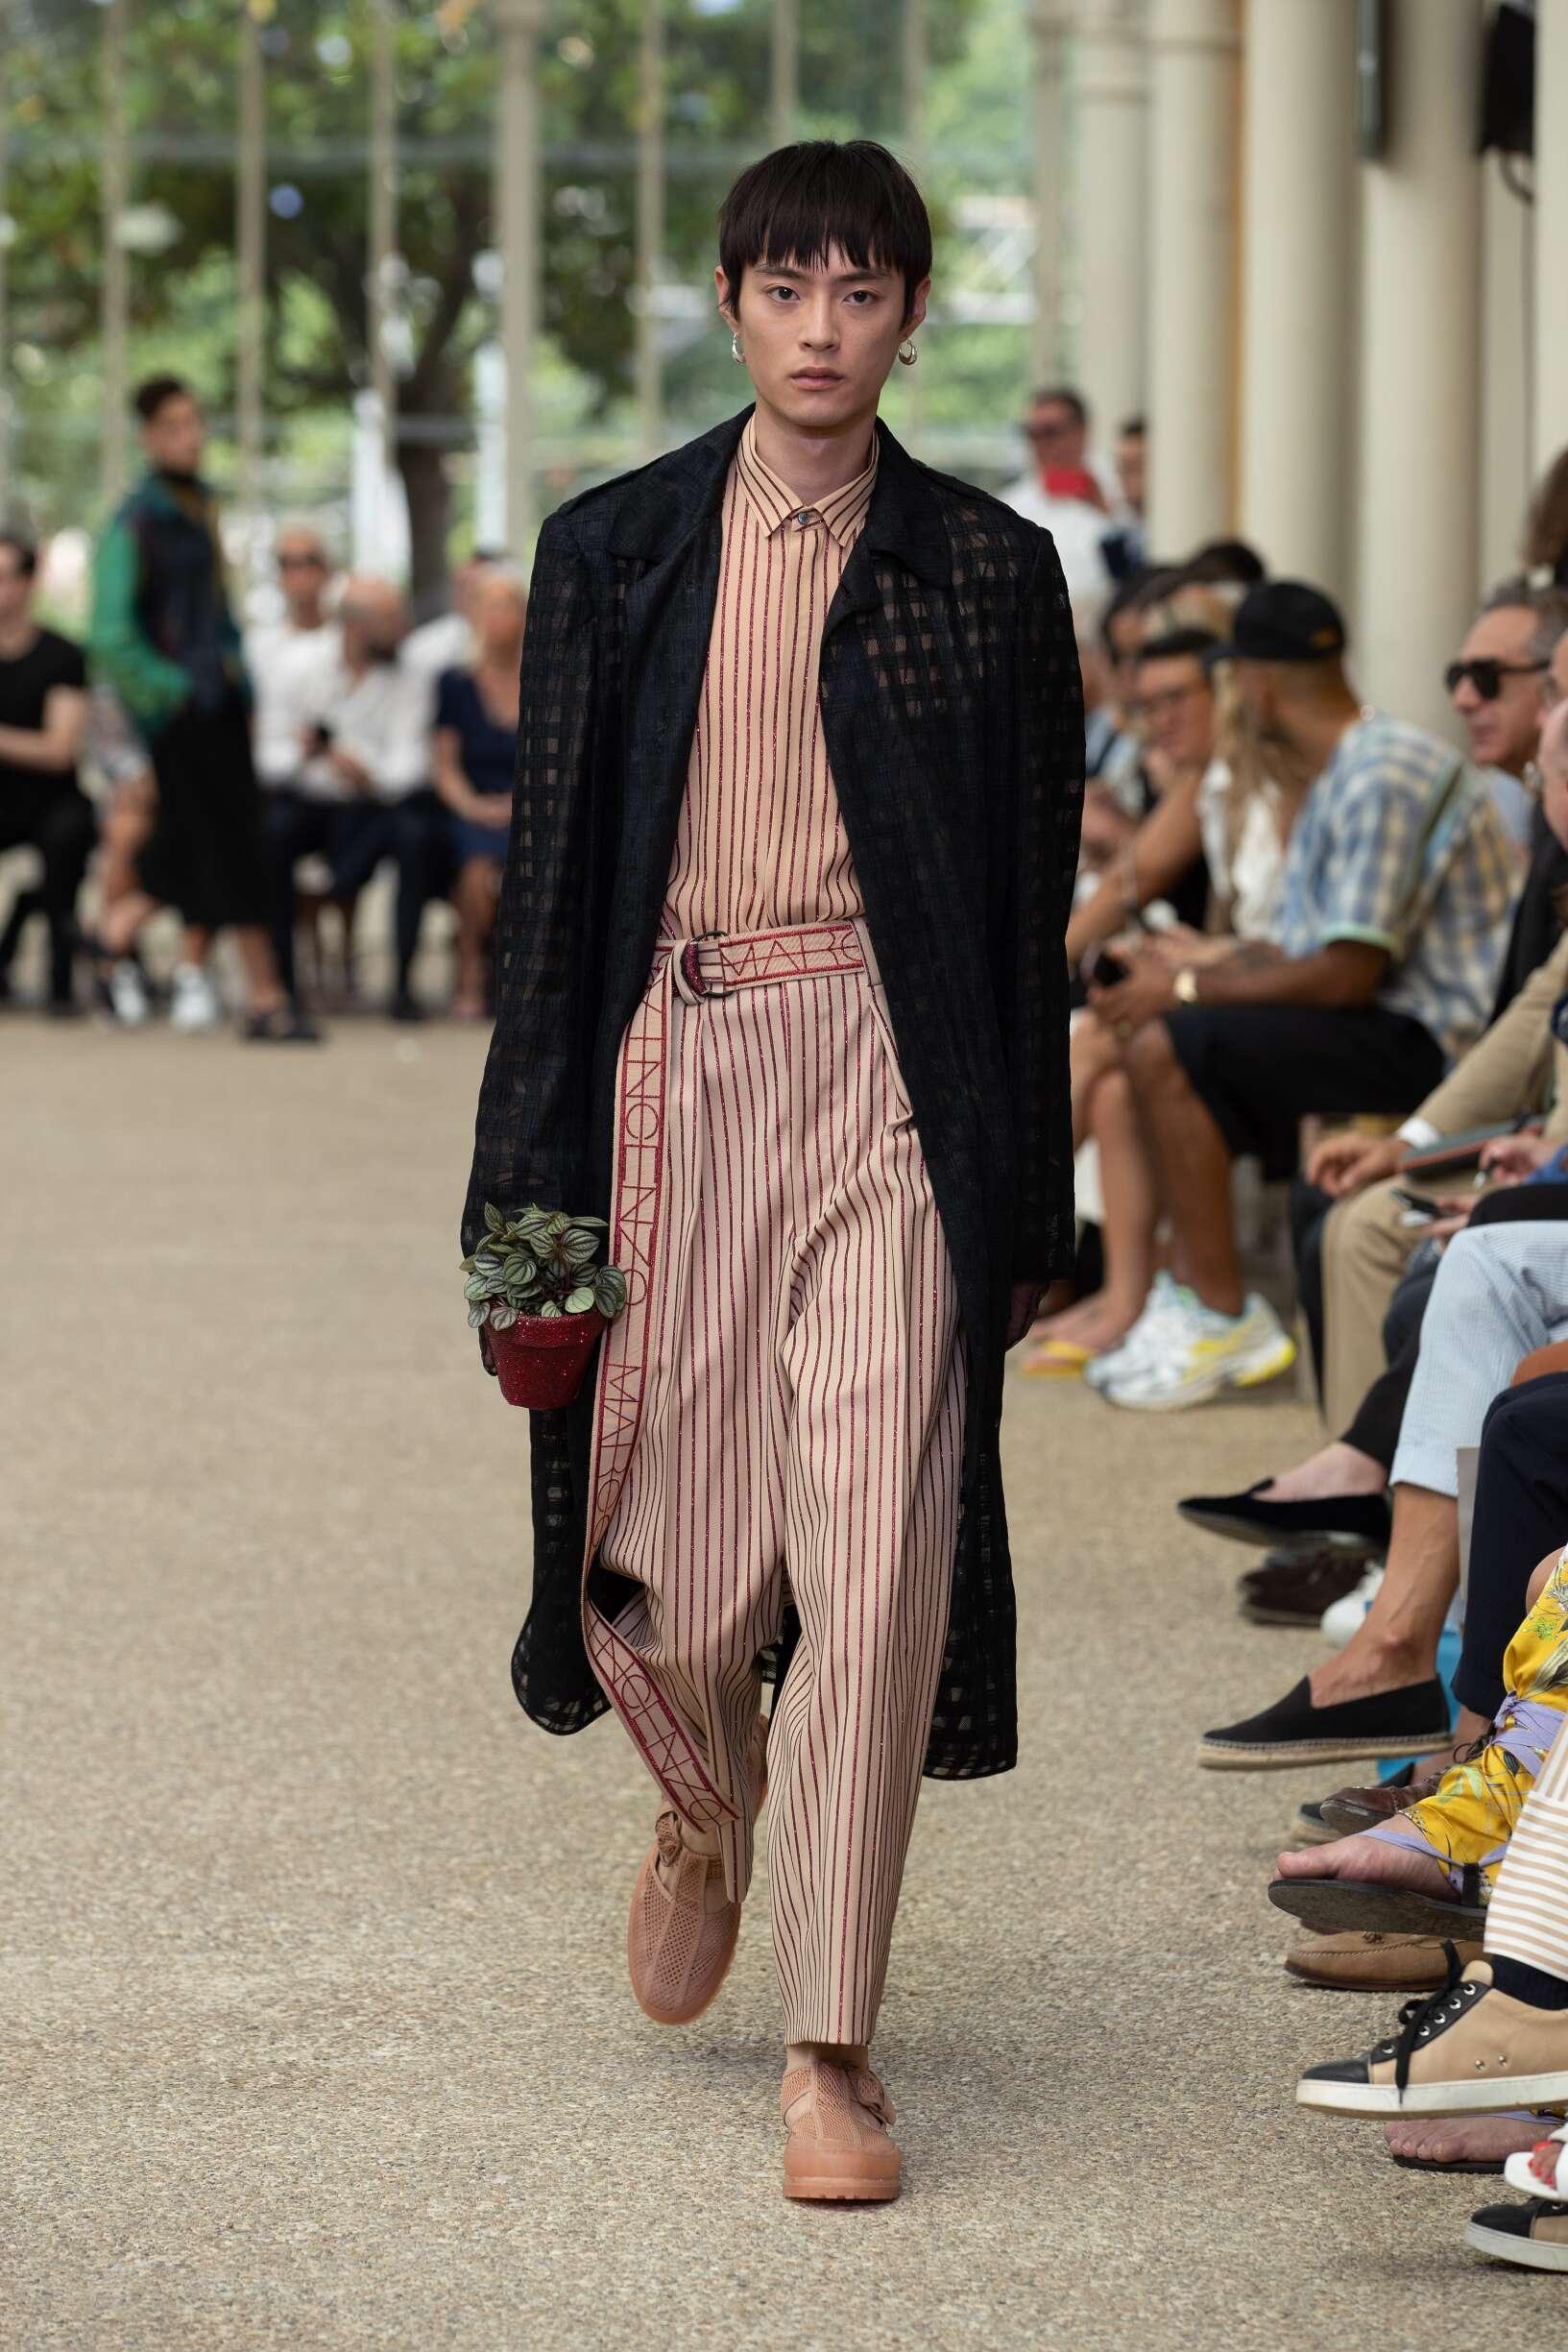 Marco De vincenzo SS 2020 Womenswear